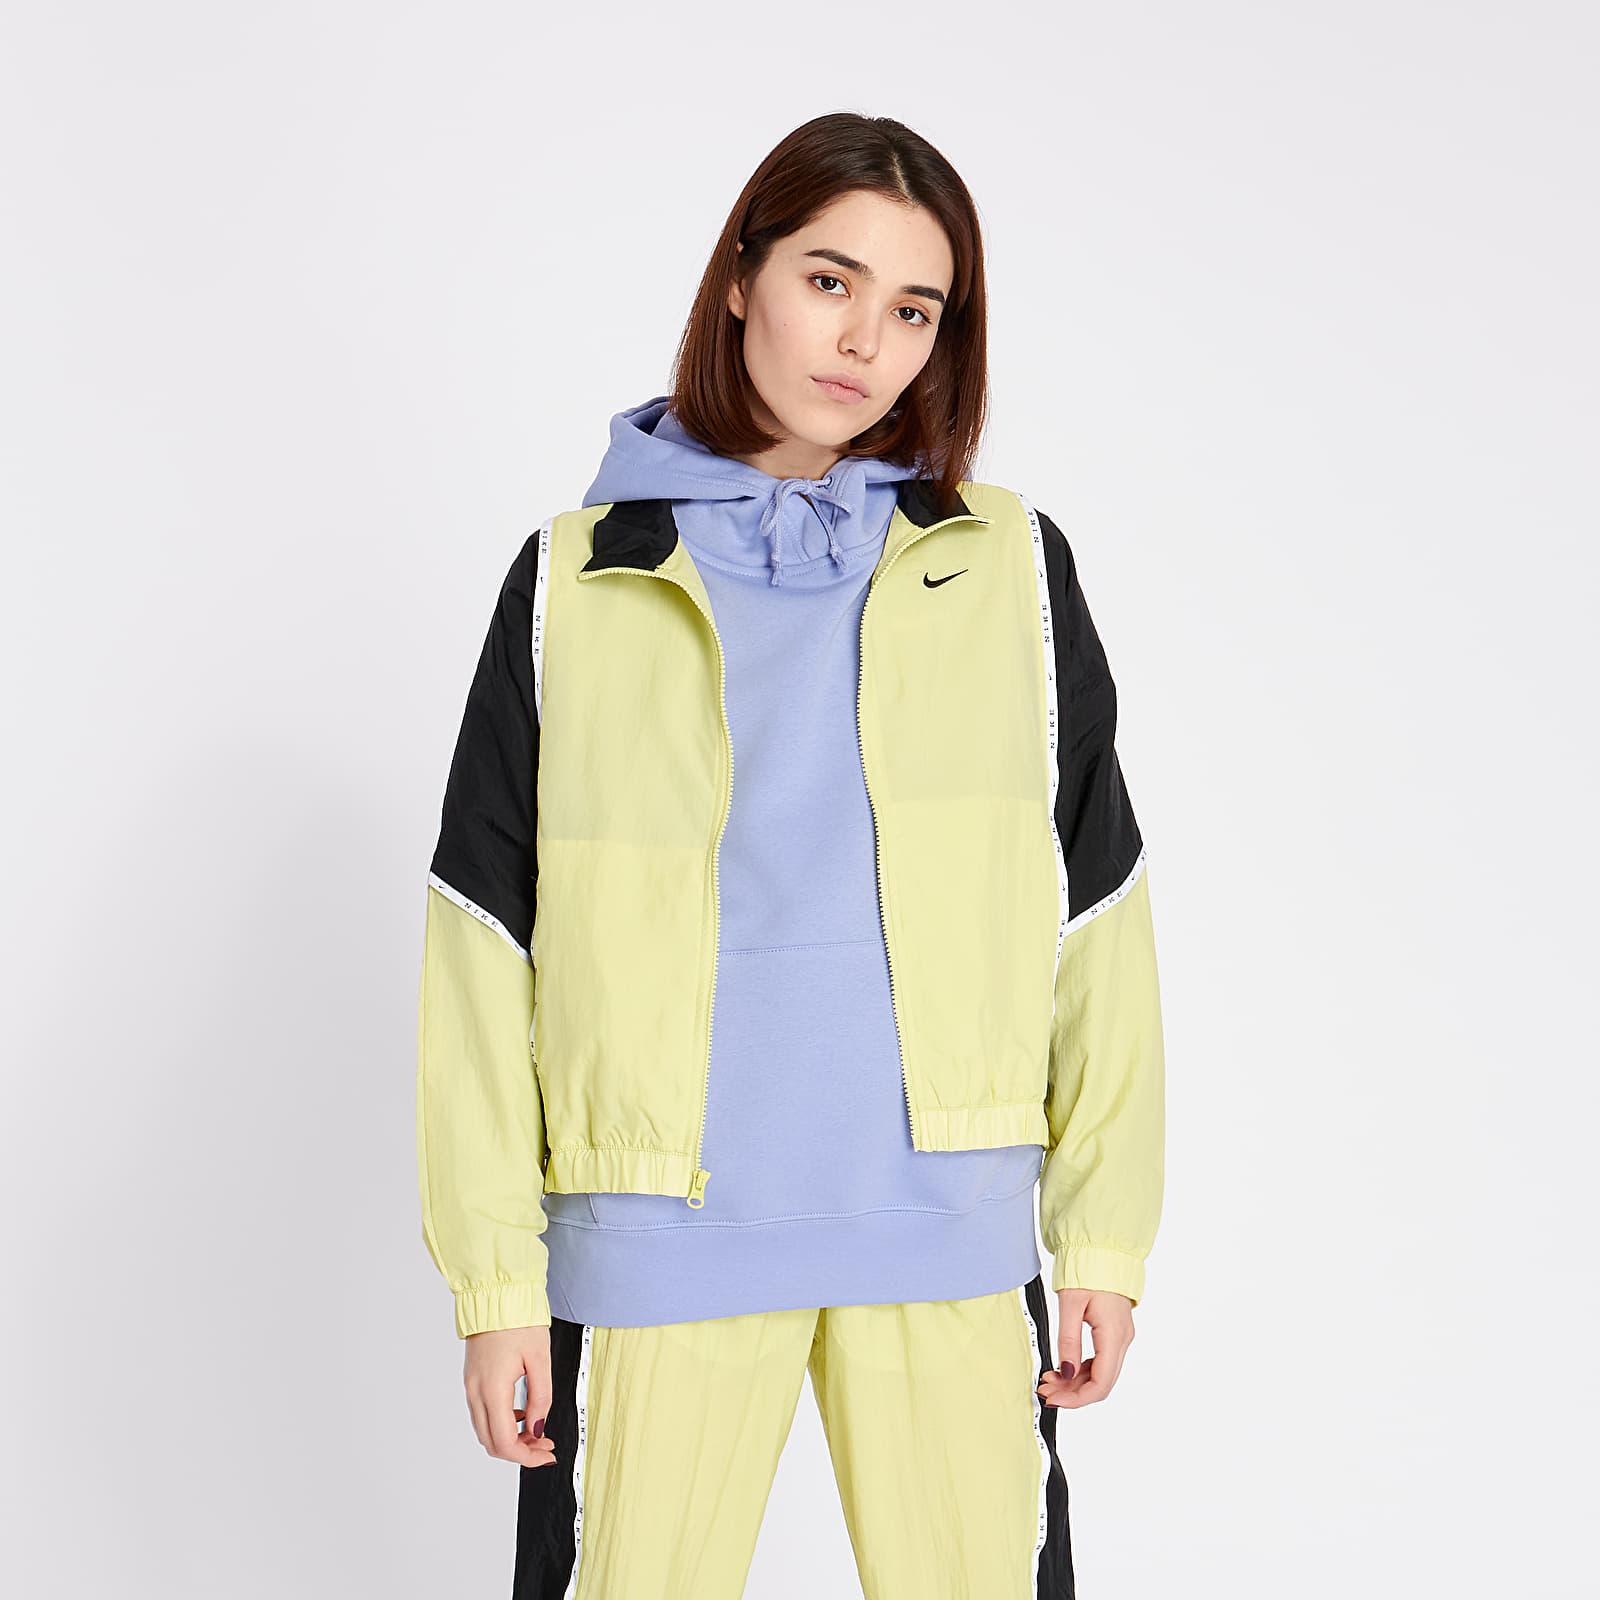 Dzsekik Nike Sportswear Woven Piping Jacket Limelight/ Black/ Black